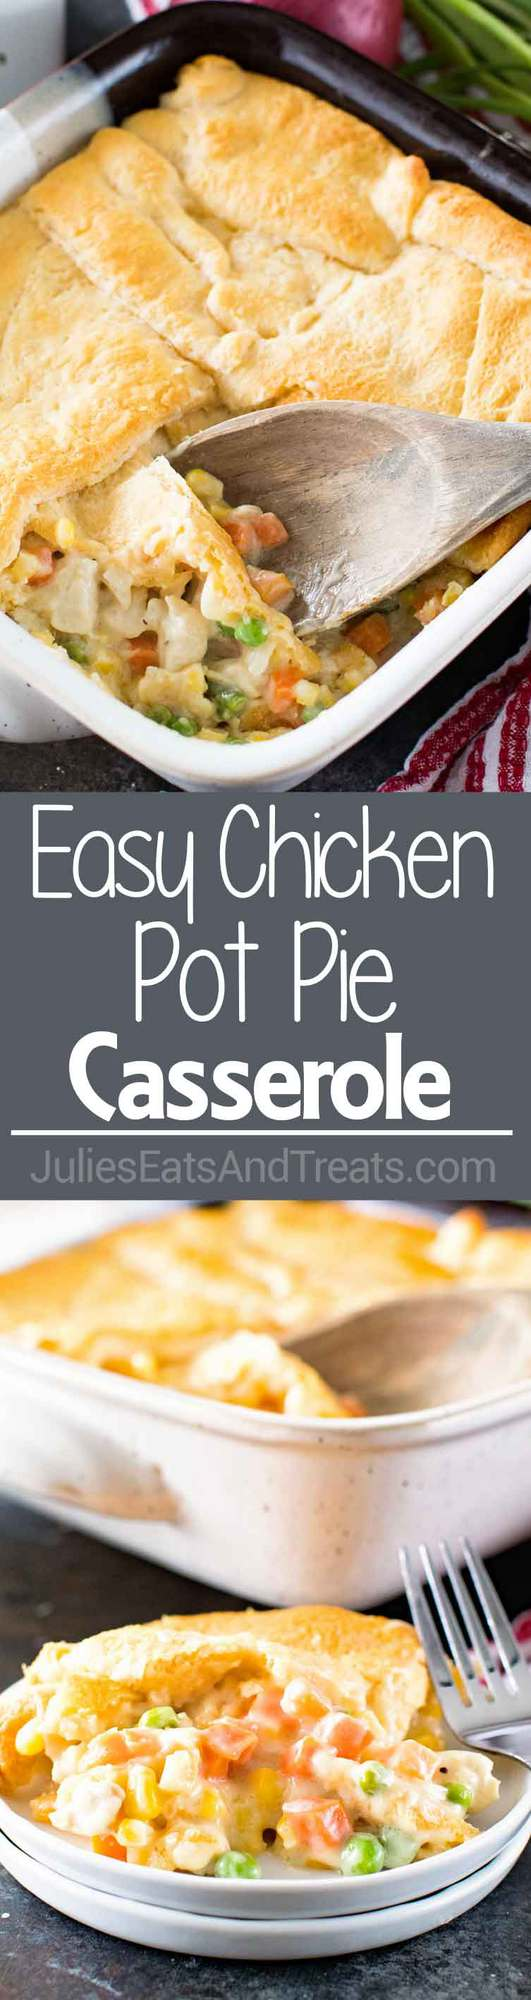 Easy Comfort Food Chicken Pot Pie Casserole Recipe